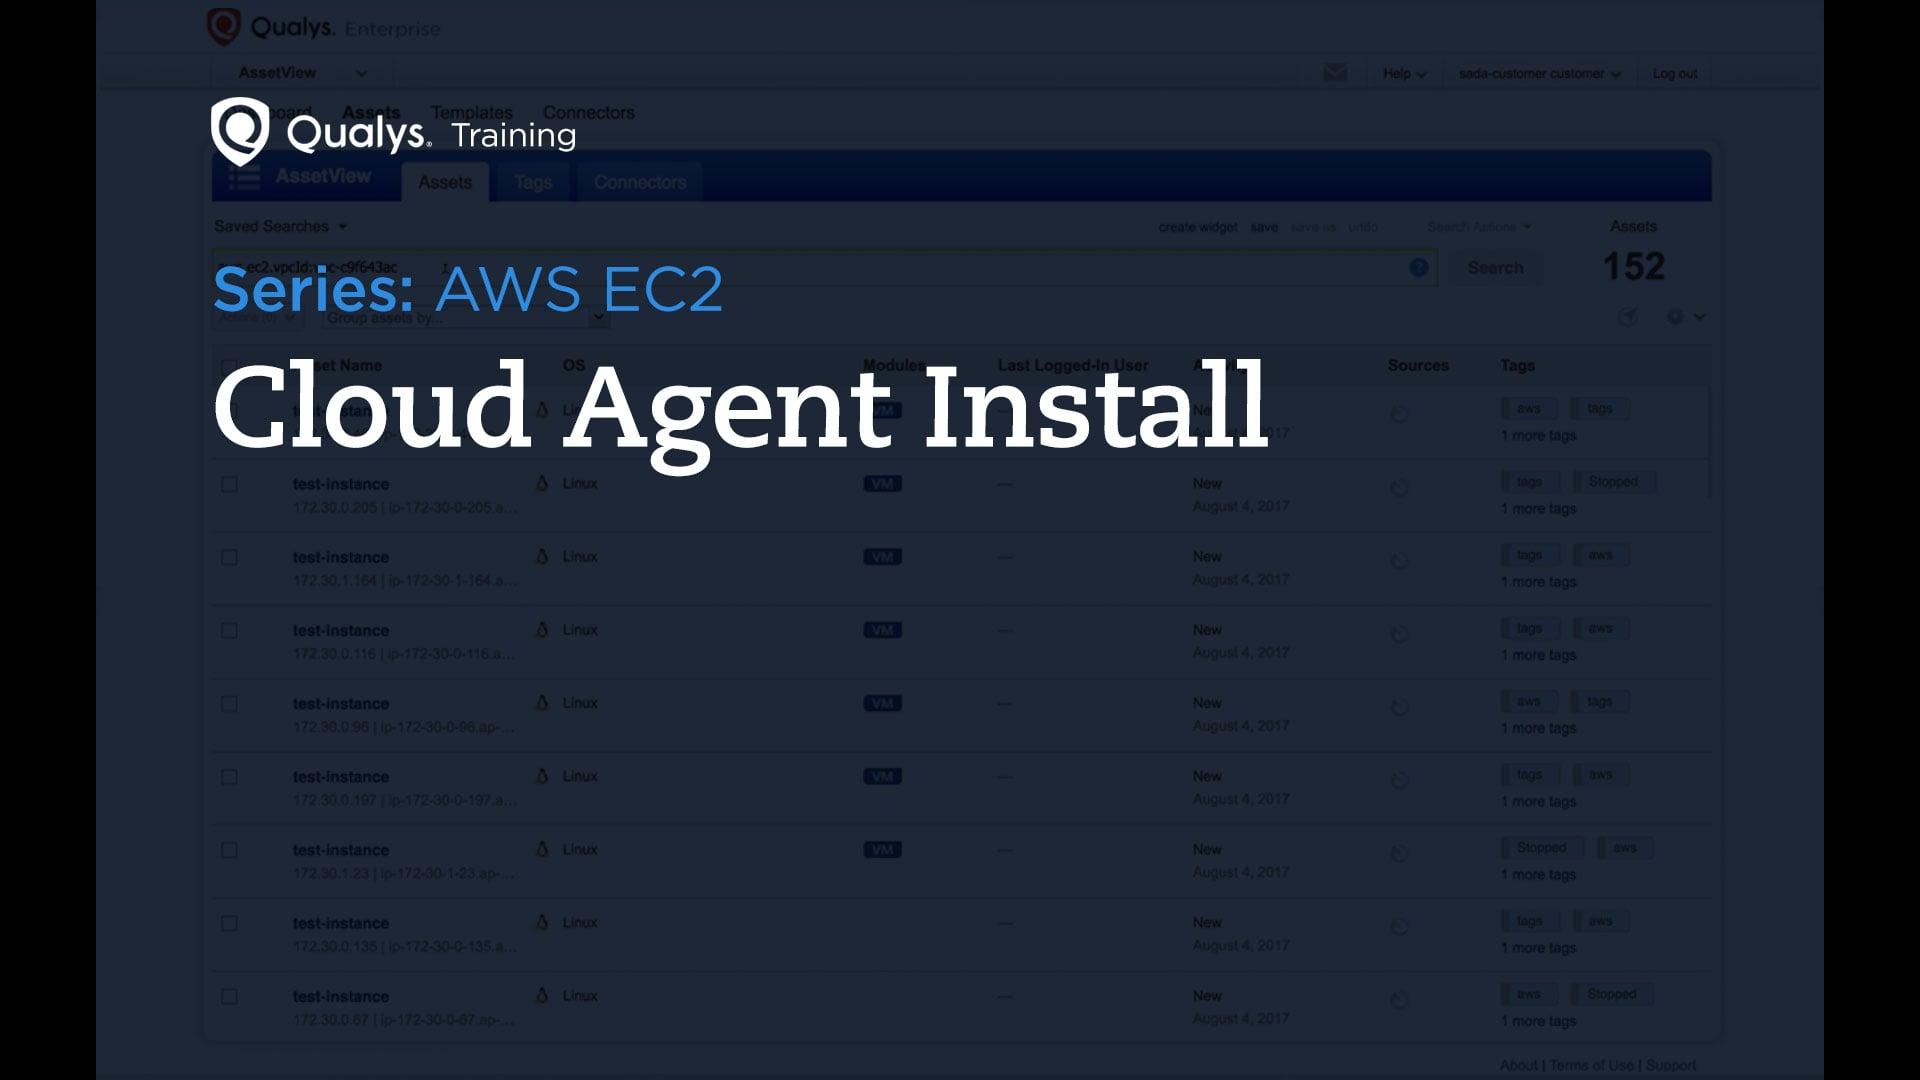 Cloud Agent Install